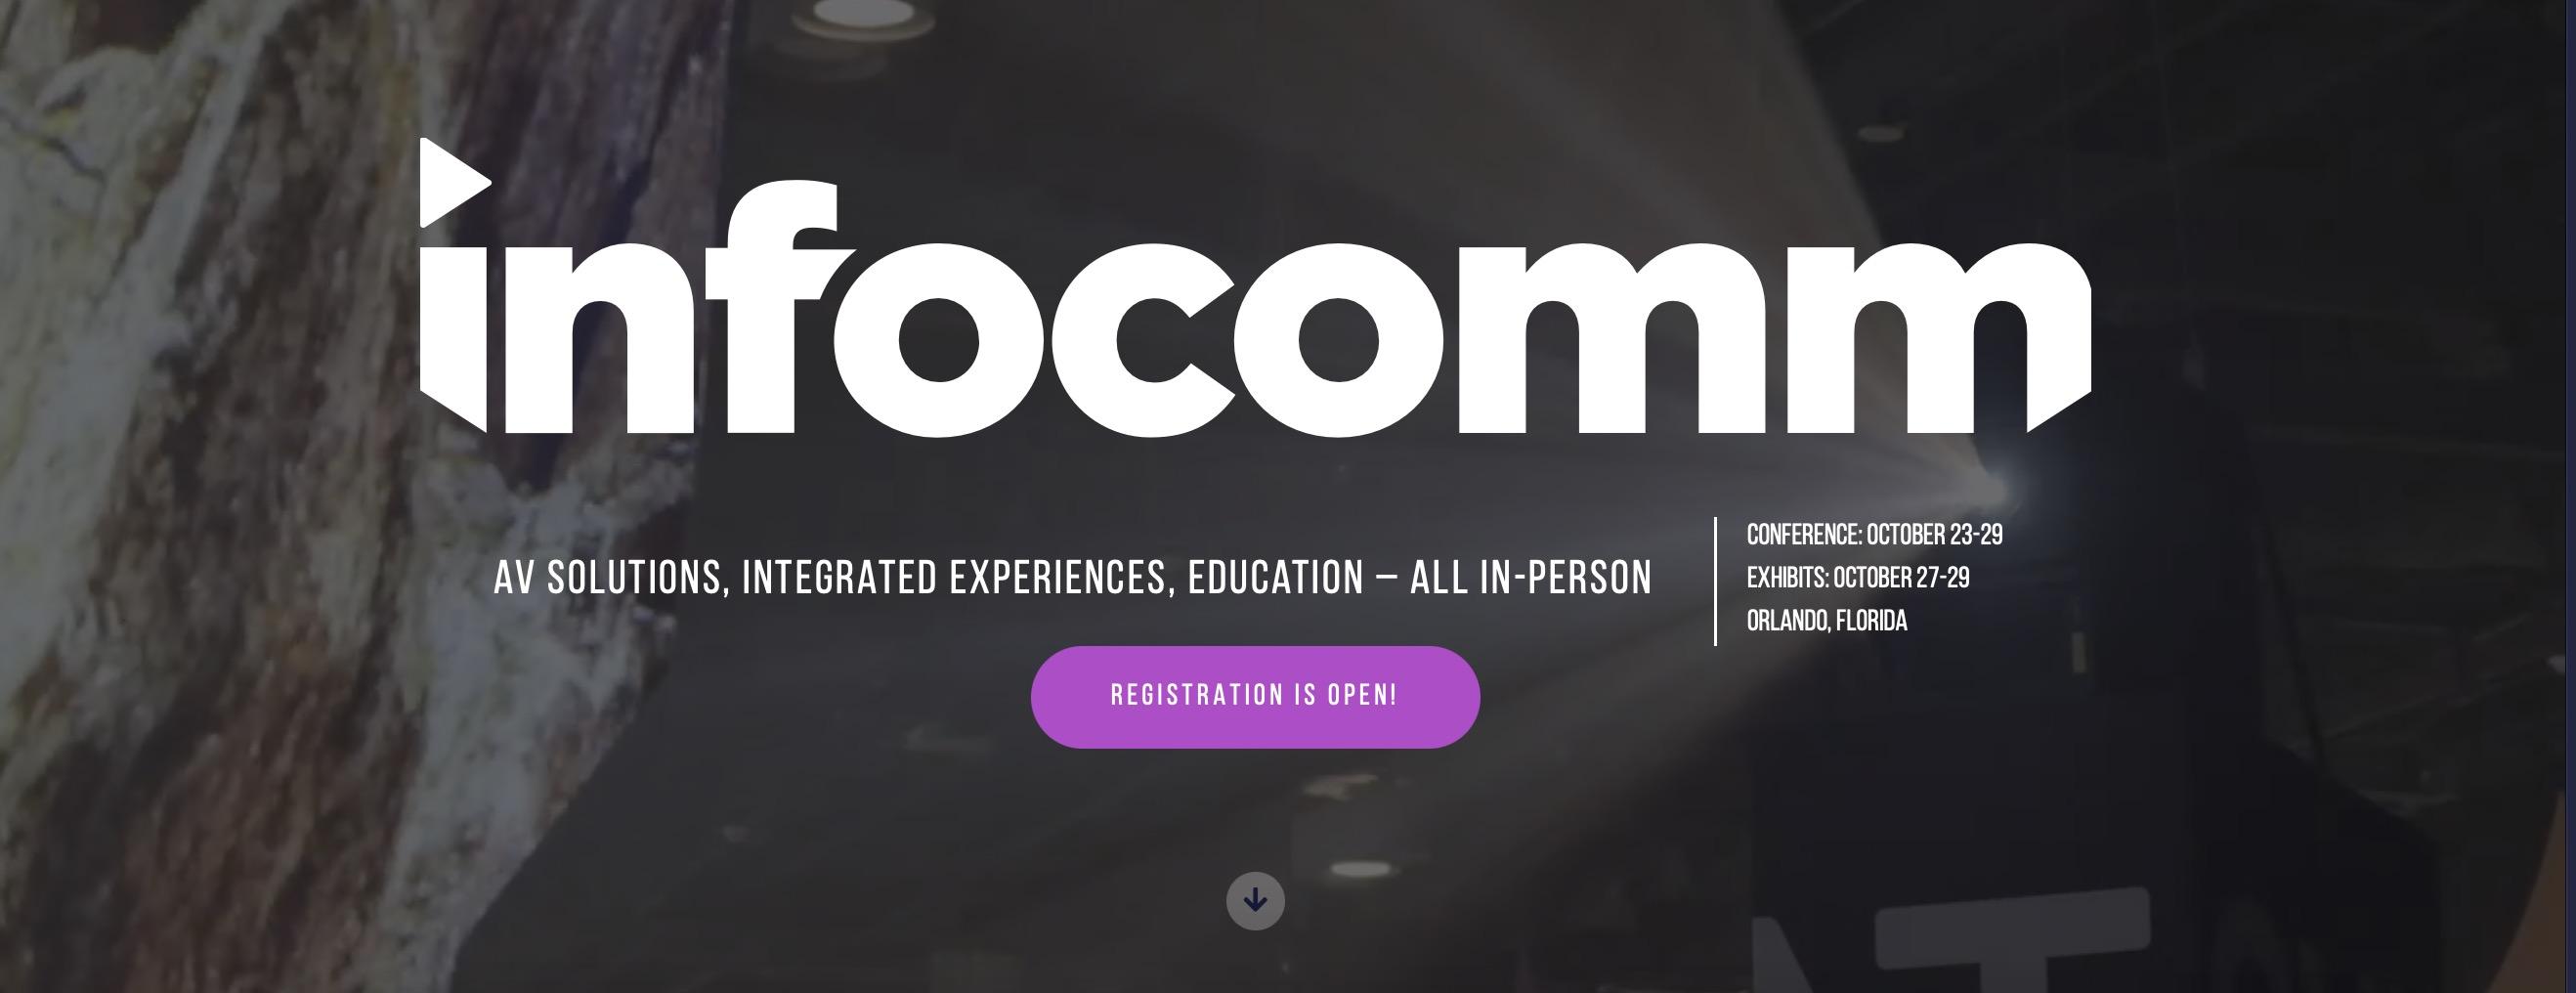 Infocomm header